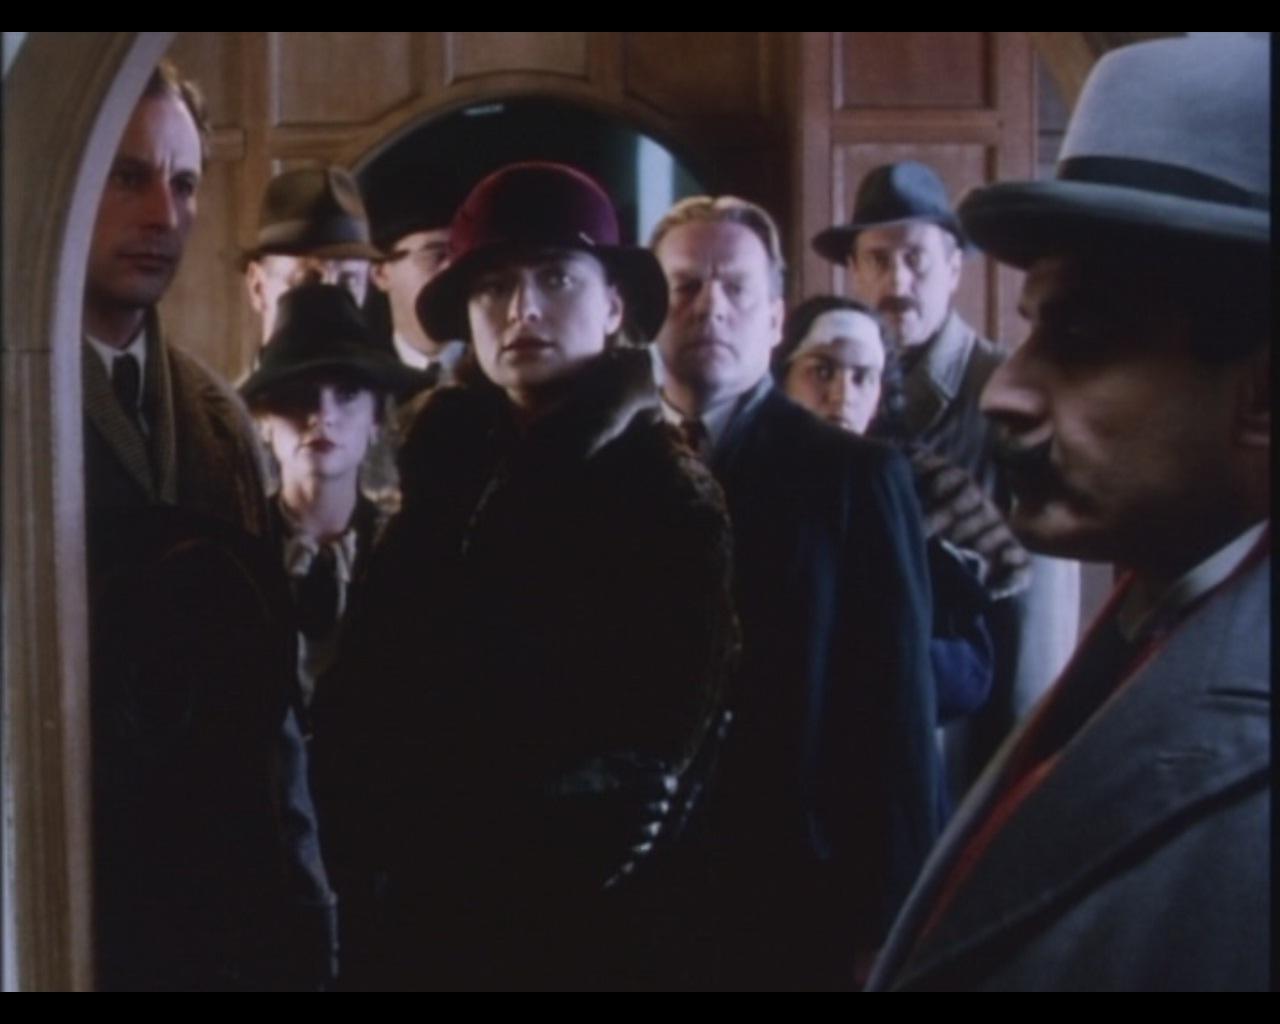 Hercule Poirots Christmas.Hercule Poirot S Christmas 1995 Review